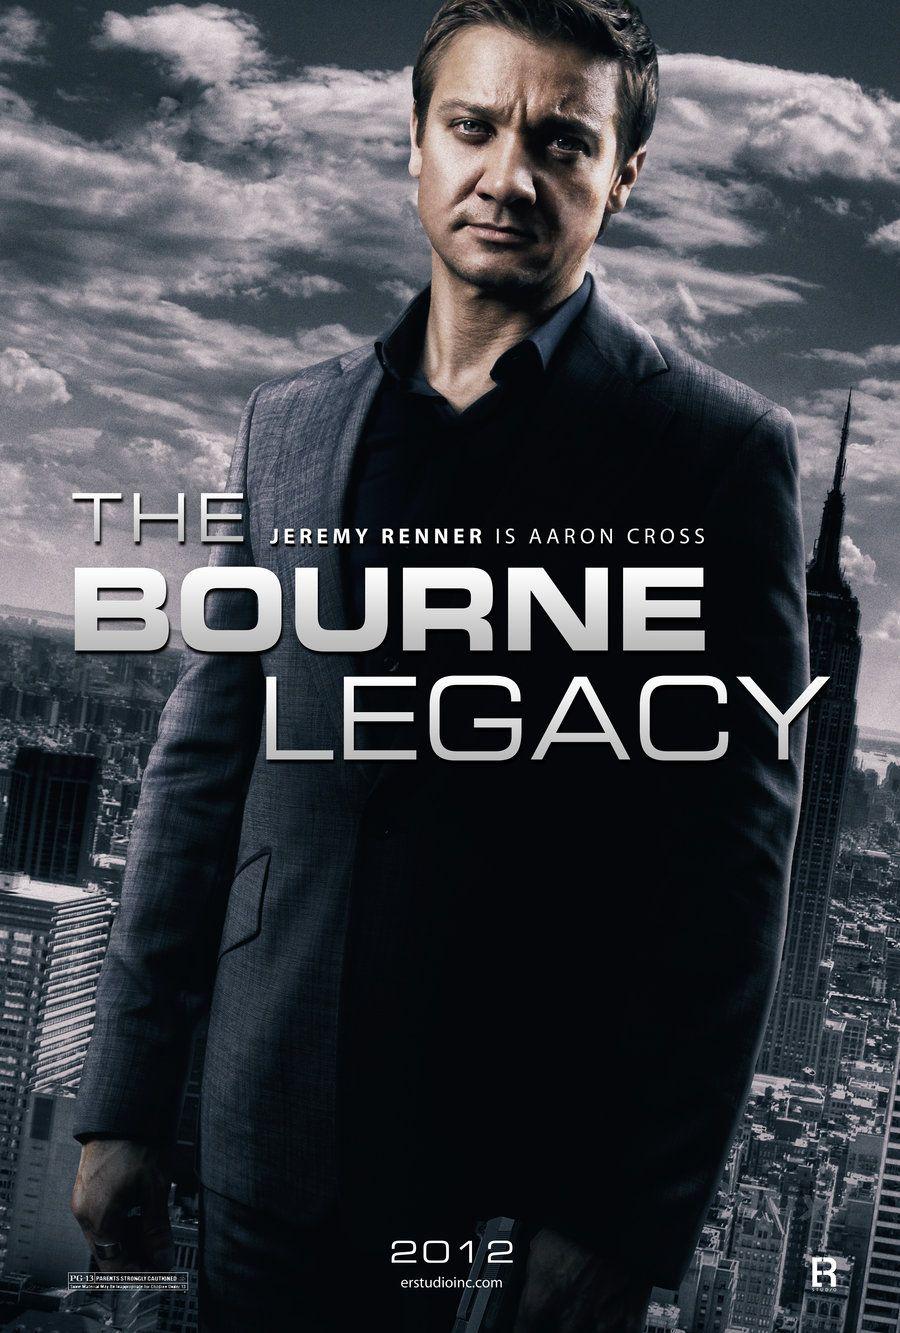 70 Gambar The Bourne Legacy Terbaik Film Box Office Jeremy Renner